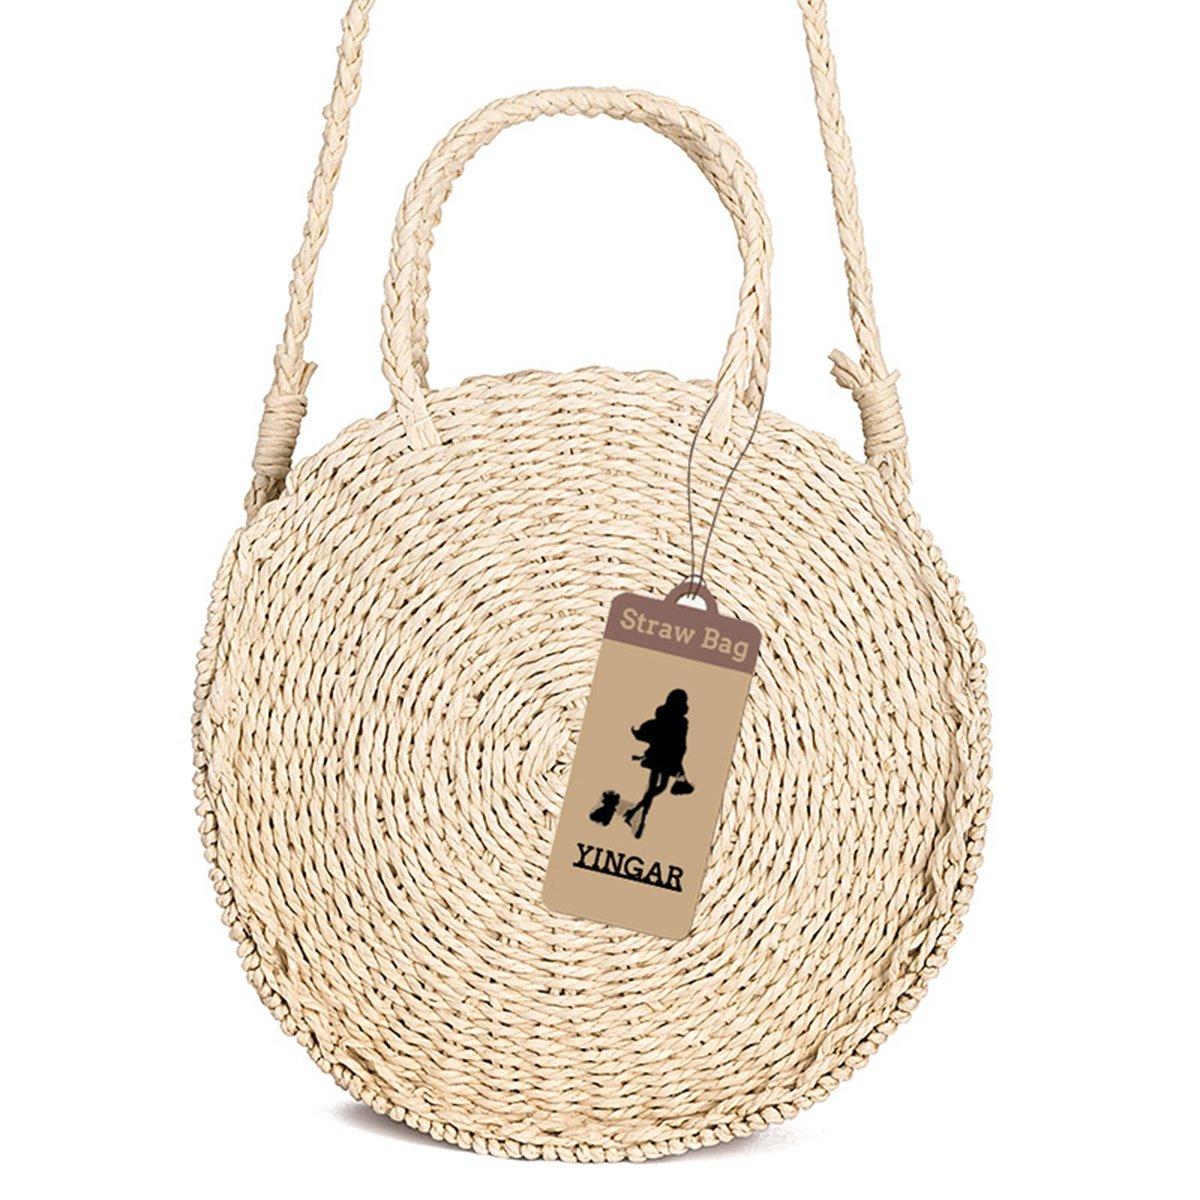 Round Straw Bag Rattan Crossbody Bag Handwoven Natural Summer Beach Shoulder Bag for Women by YINGAR